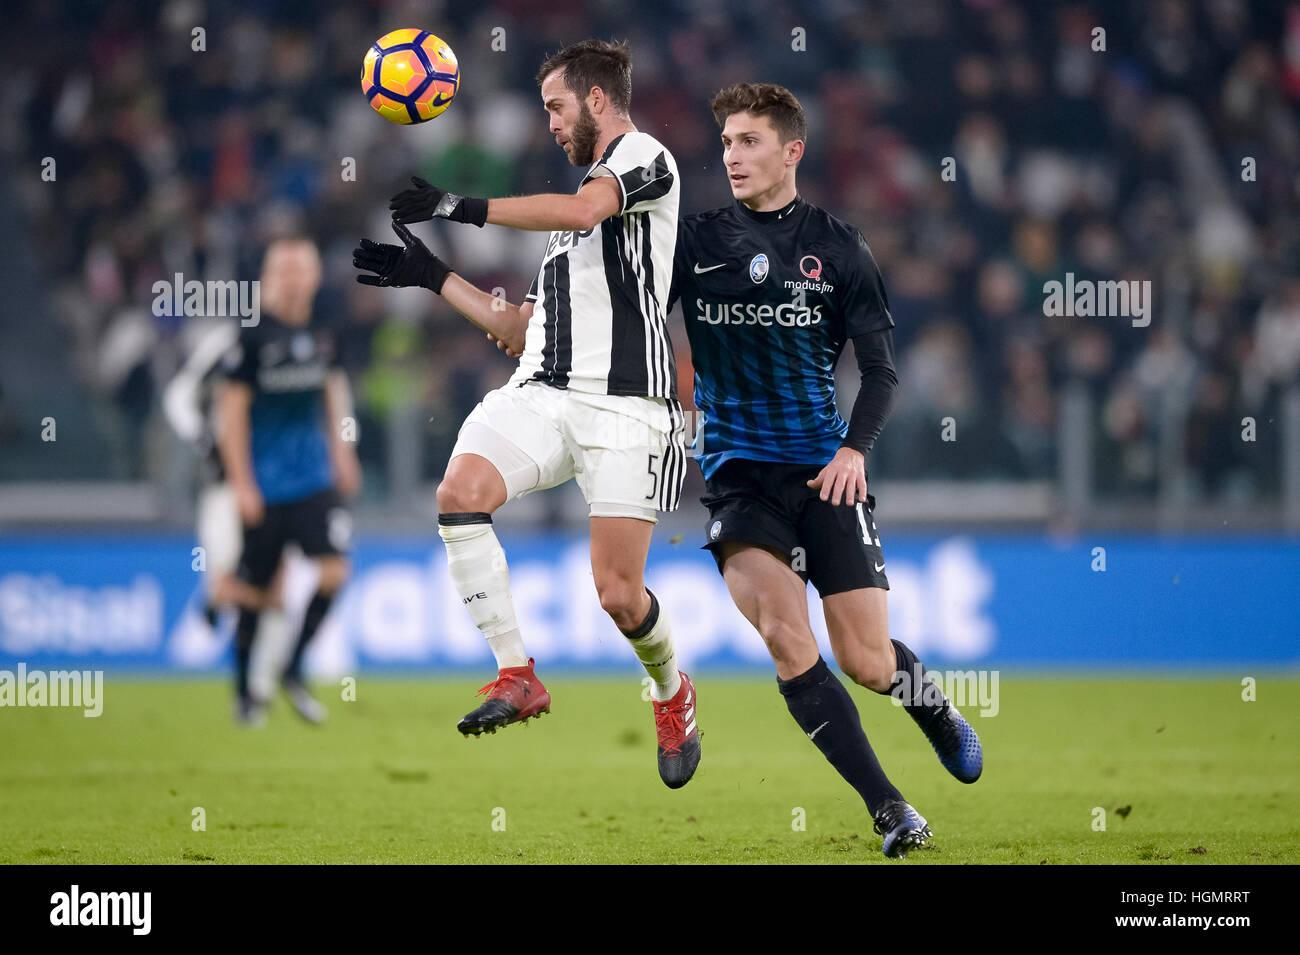 Turin, Italy. 2017, 11 January: Miralem Pjanic (left) of Juventus FC and Mattia Caldara of Atalanta BC compete for - Stock Image